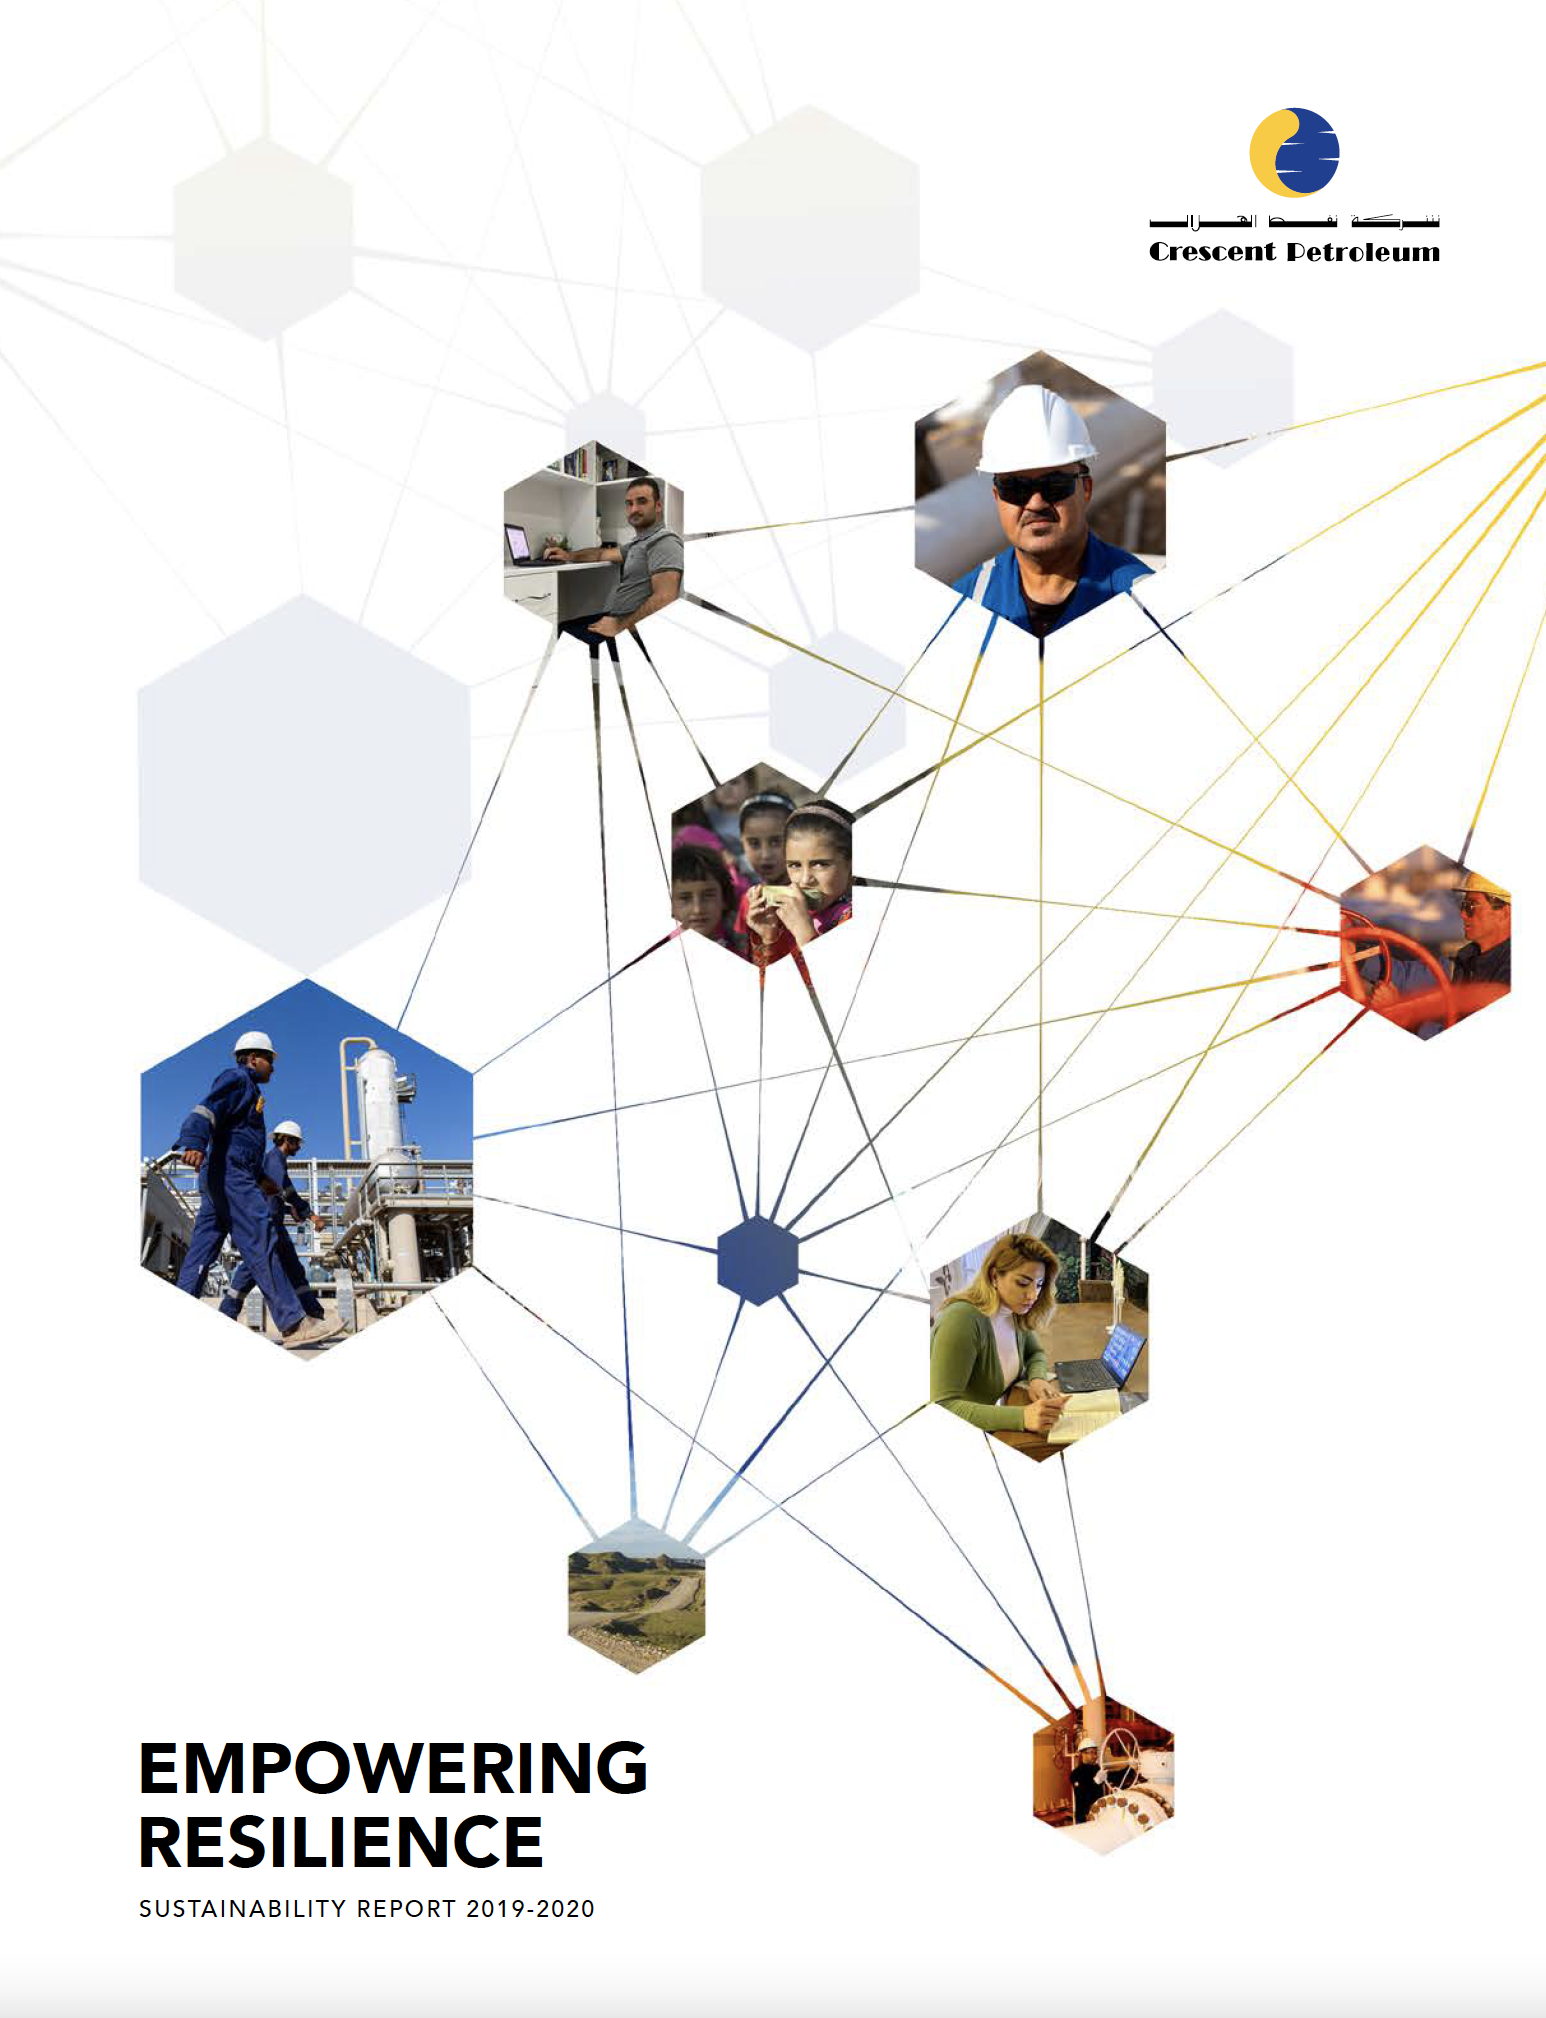 Sustainability Report 2019-2020